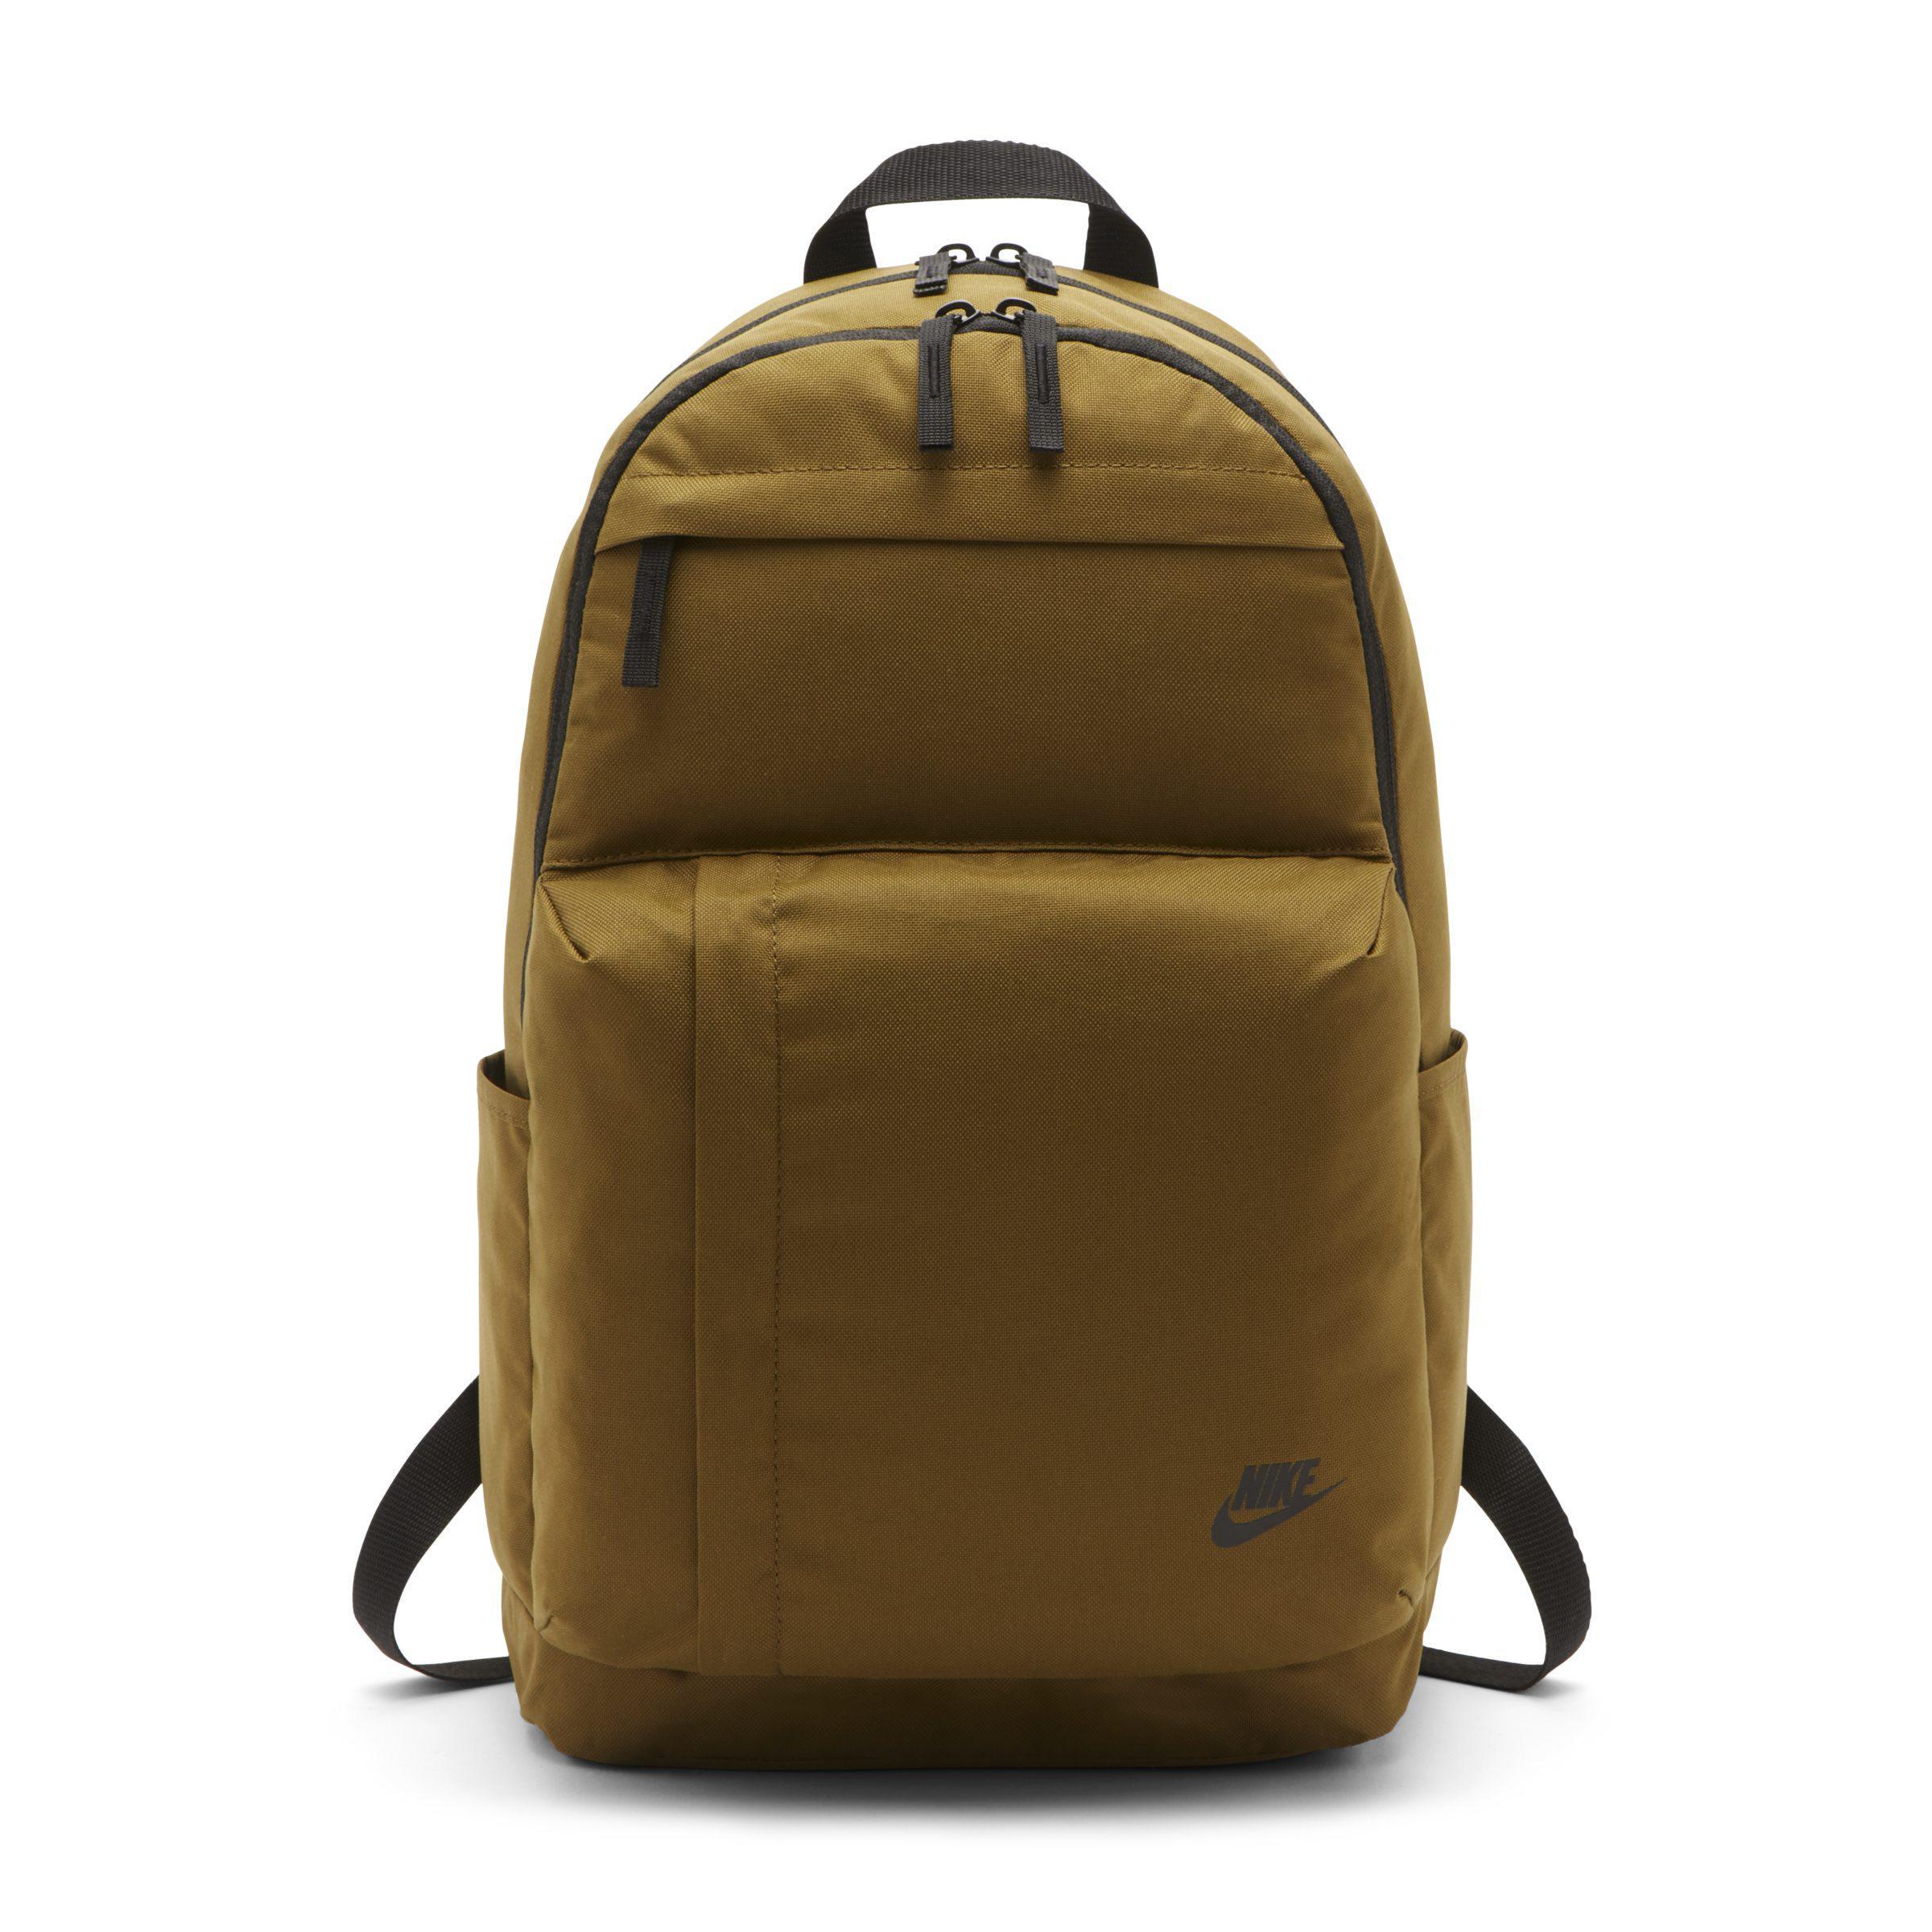 Nike Elemental Backpack in Green for Men - Lyst 706c695c5528b